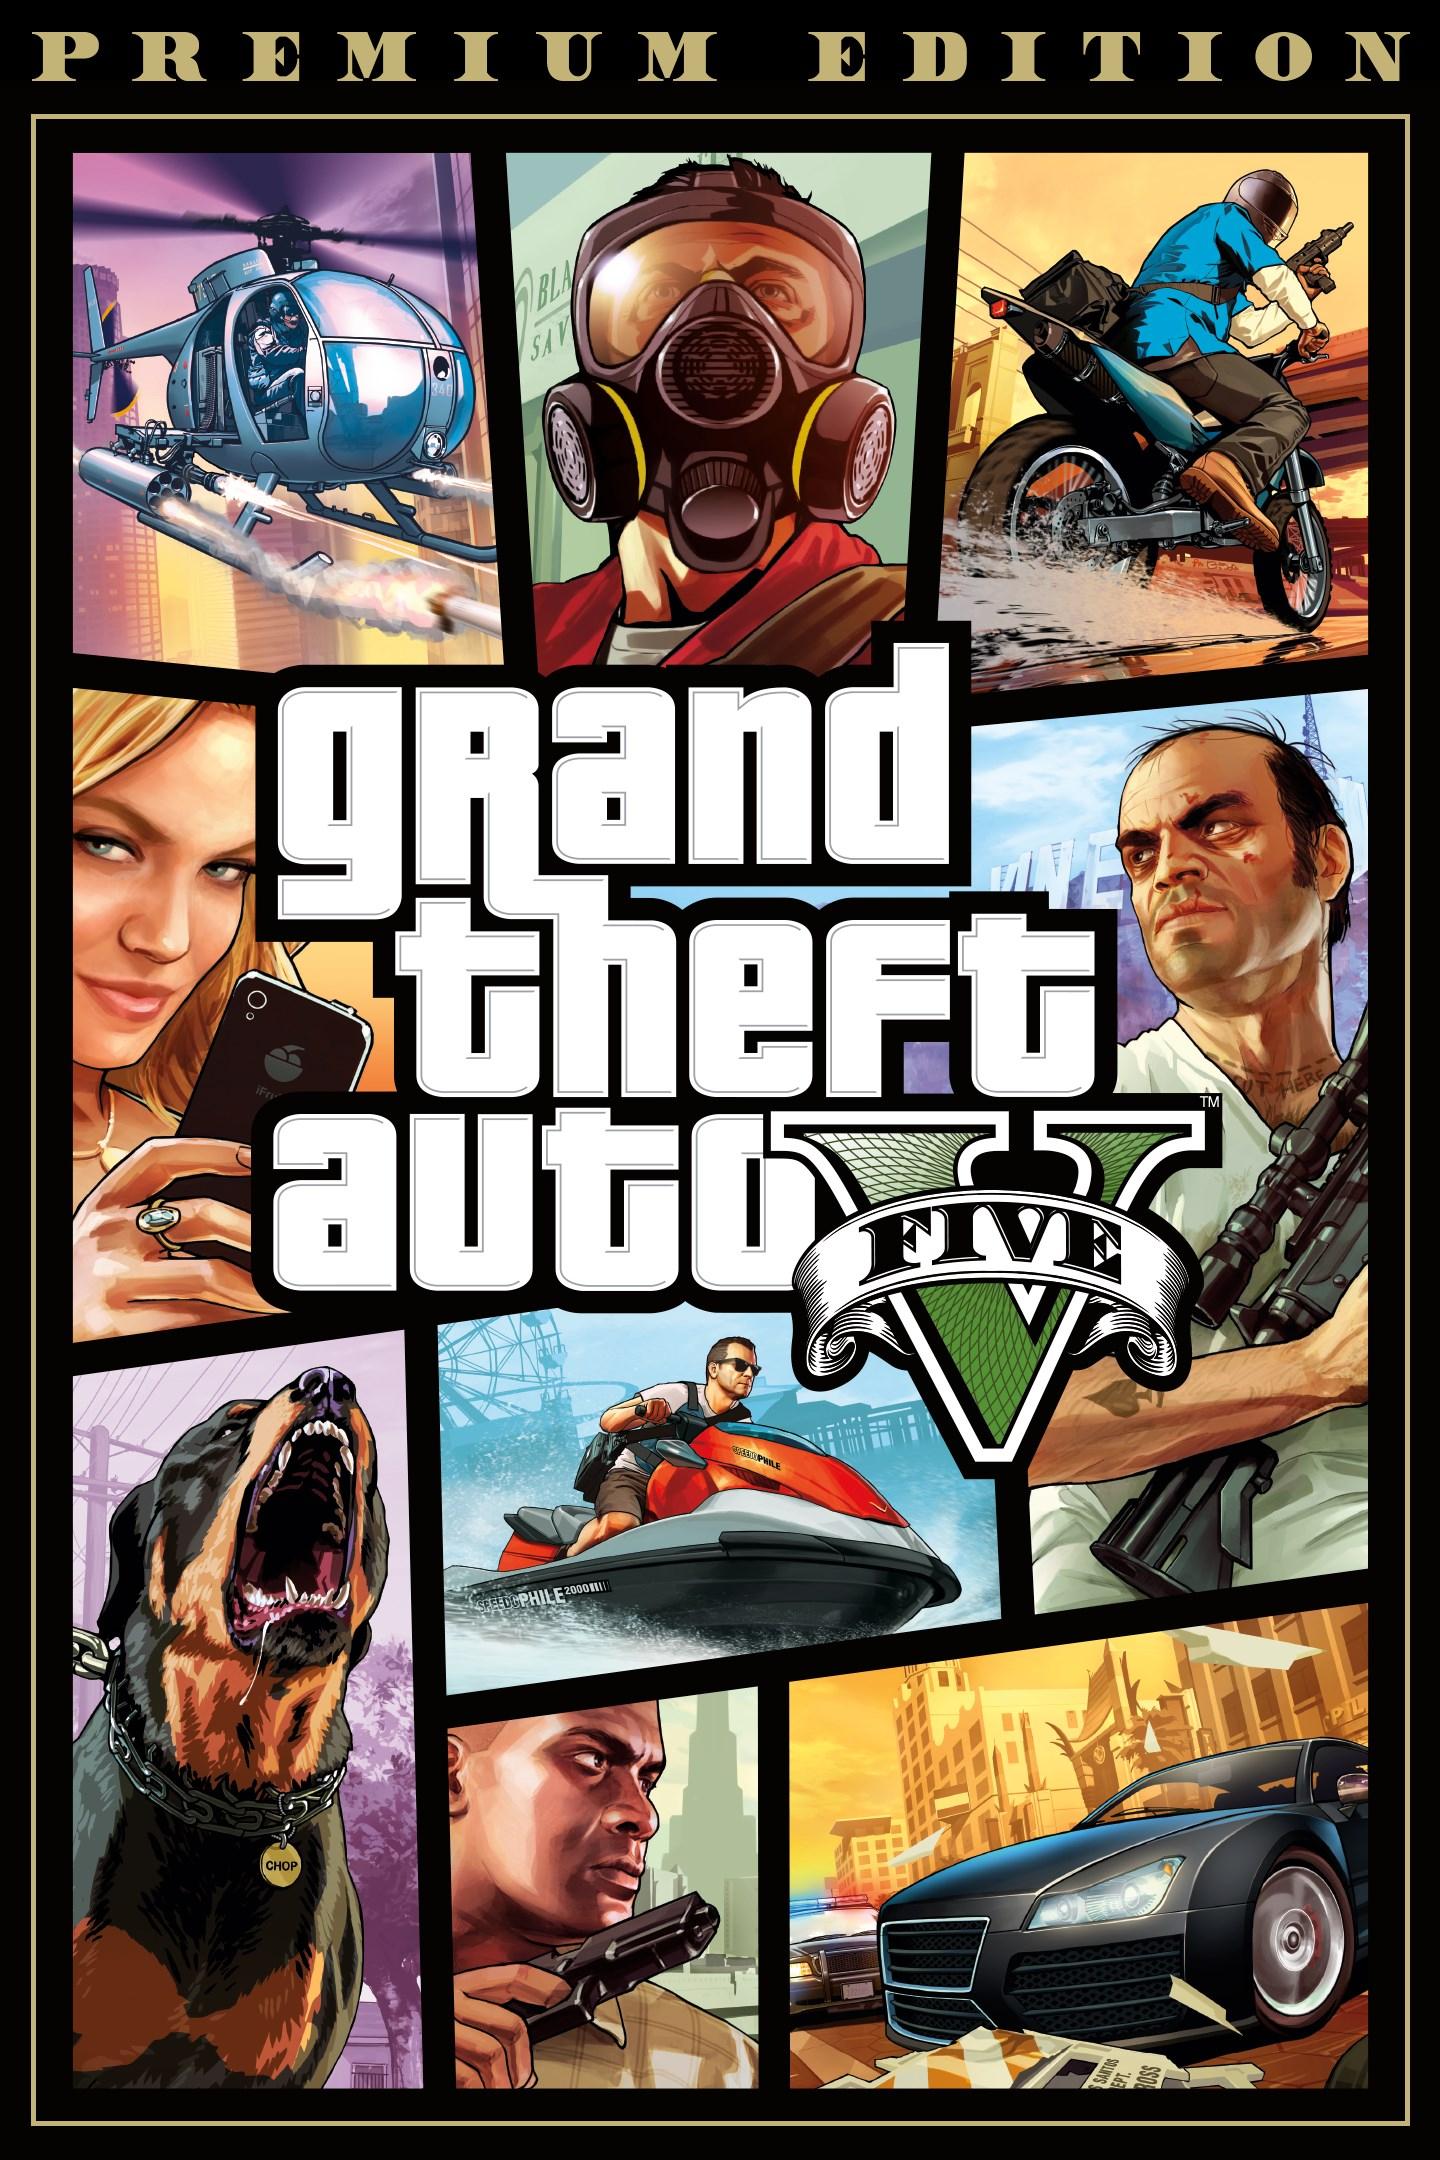 Grand Theft Auto v Premium Online Edition £12.49 Microsoft Store for Xbox One